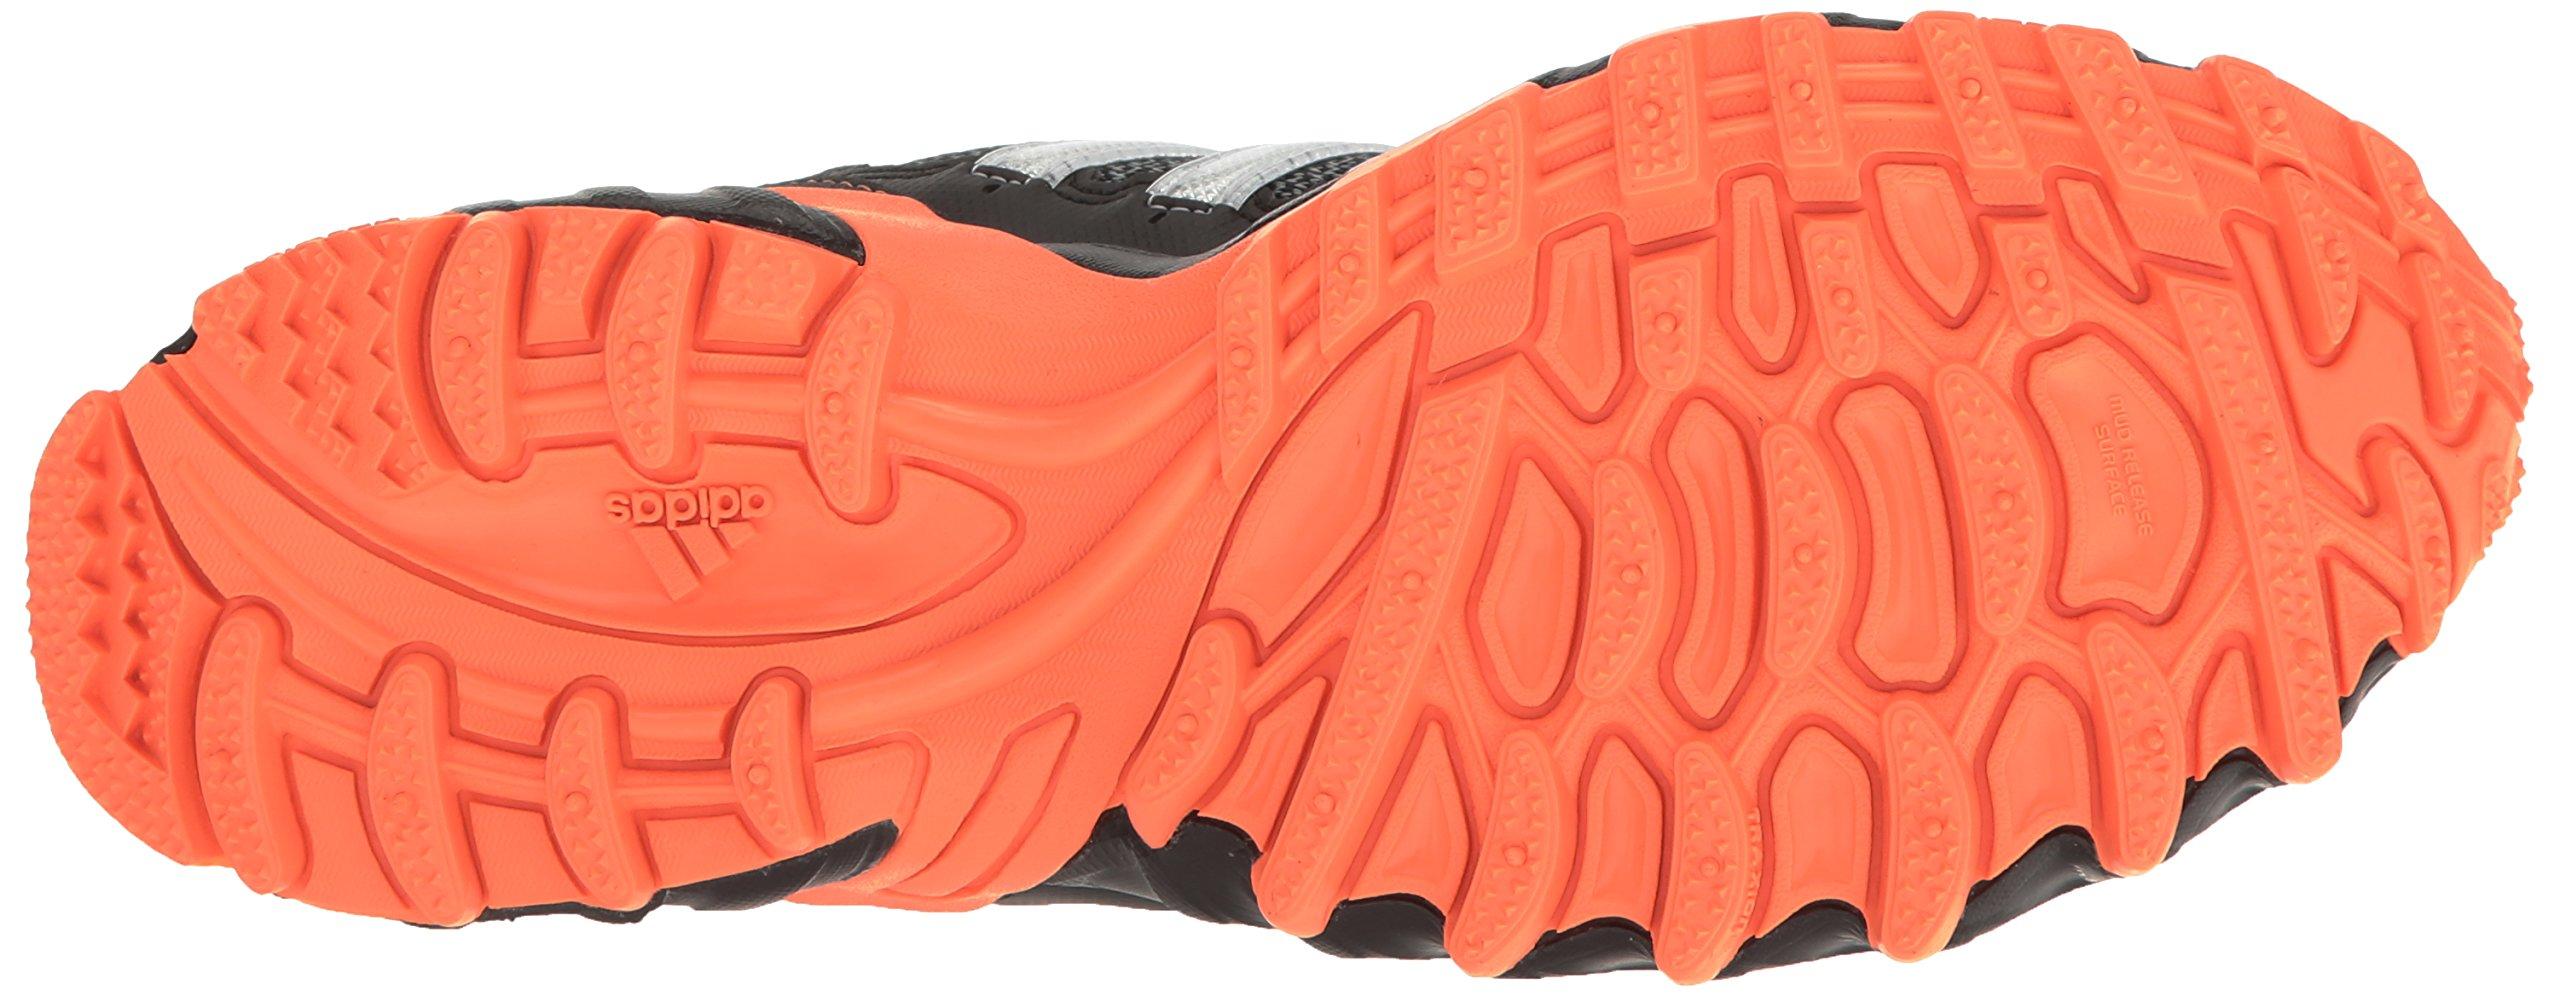 adidas Women's Rockadia Trail W Running Shoe Black/White/Easy Orange 6 M US by adidas (Image #3)